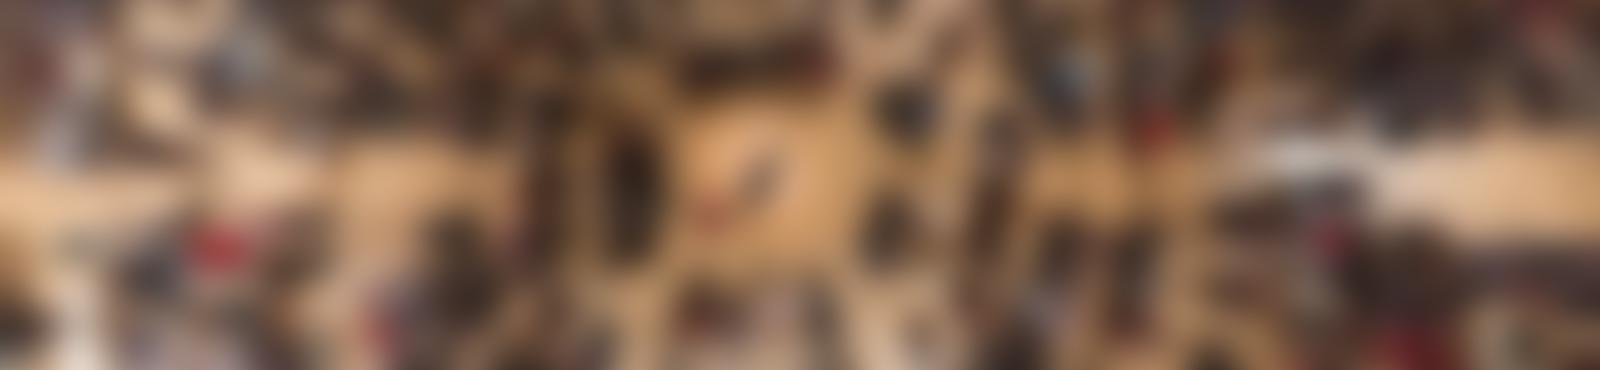 Blurred b00b17c8 911e 490a 8907 ec4669fe9350